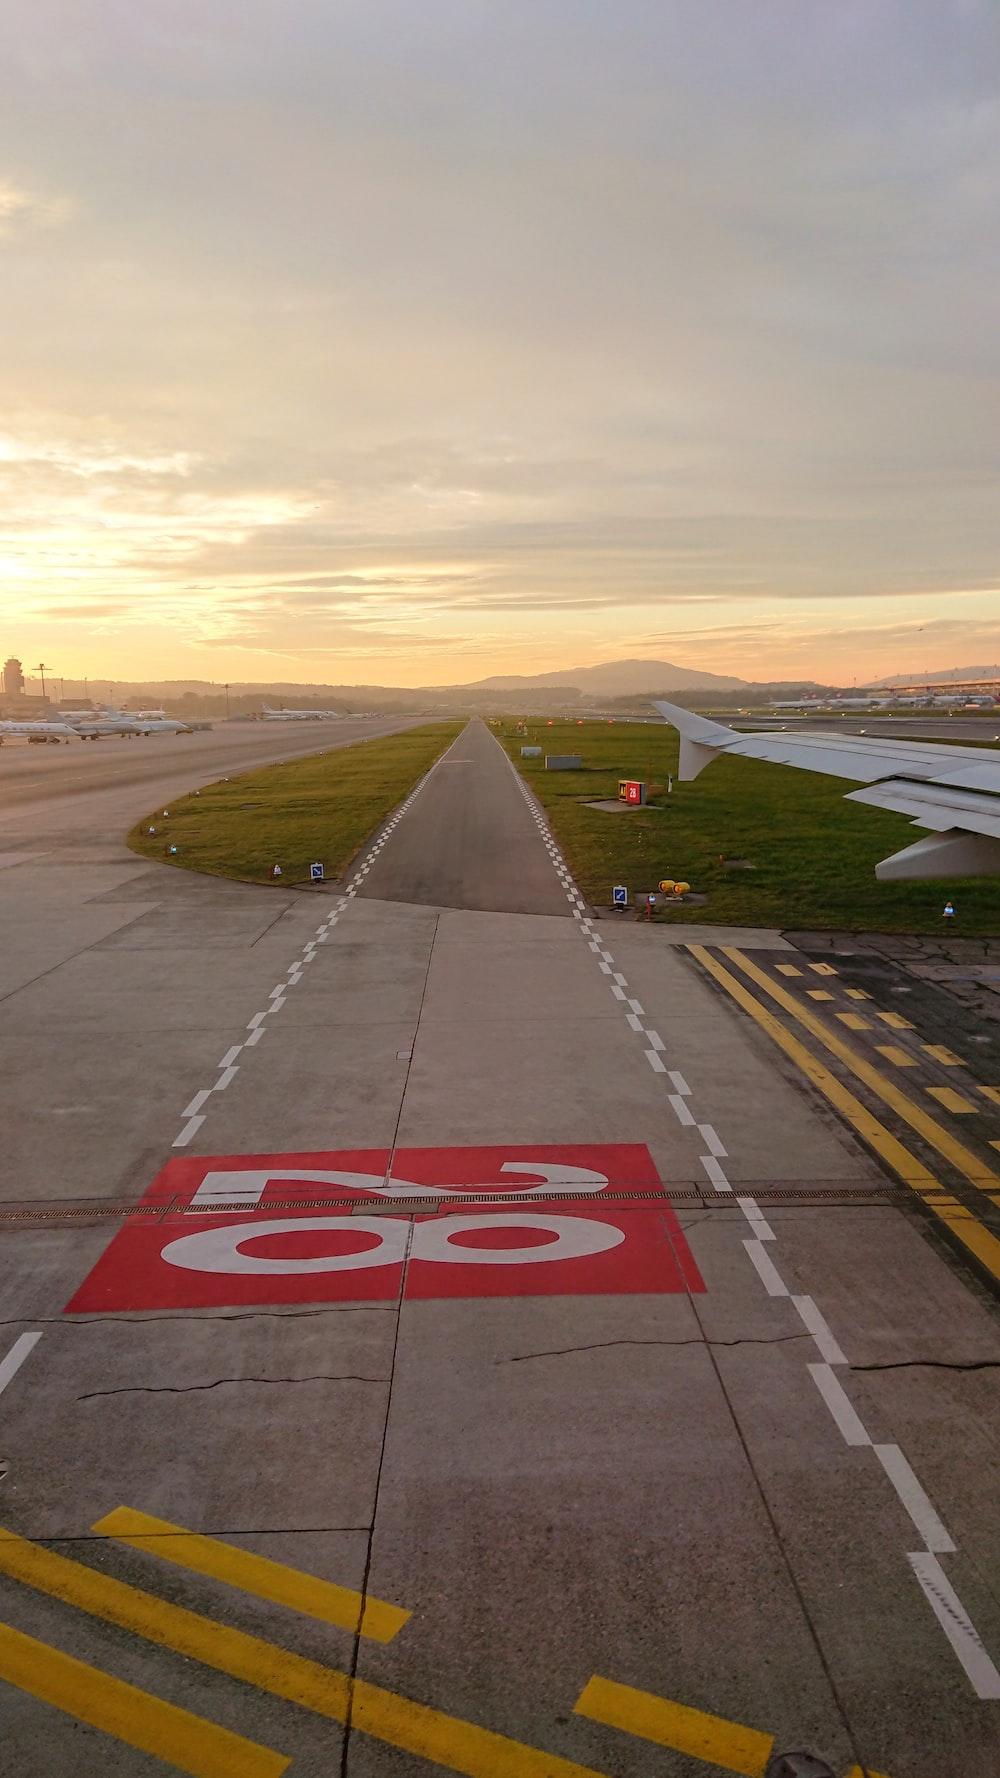 grey airport pavement